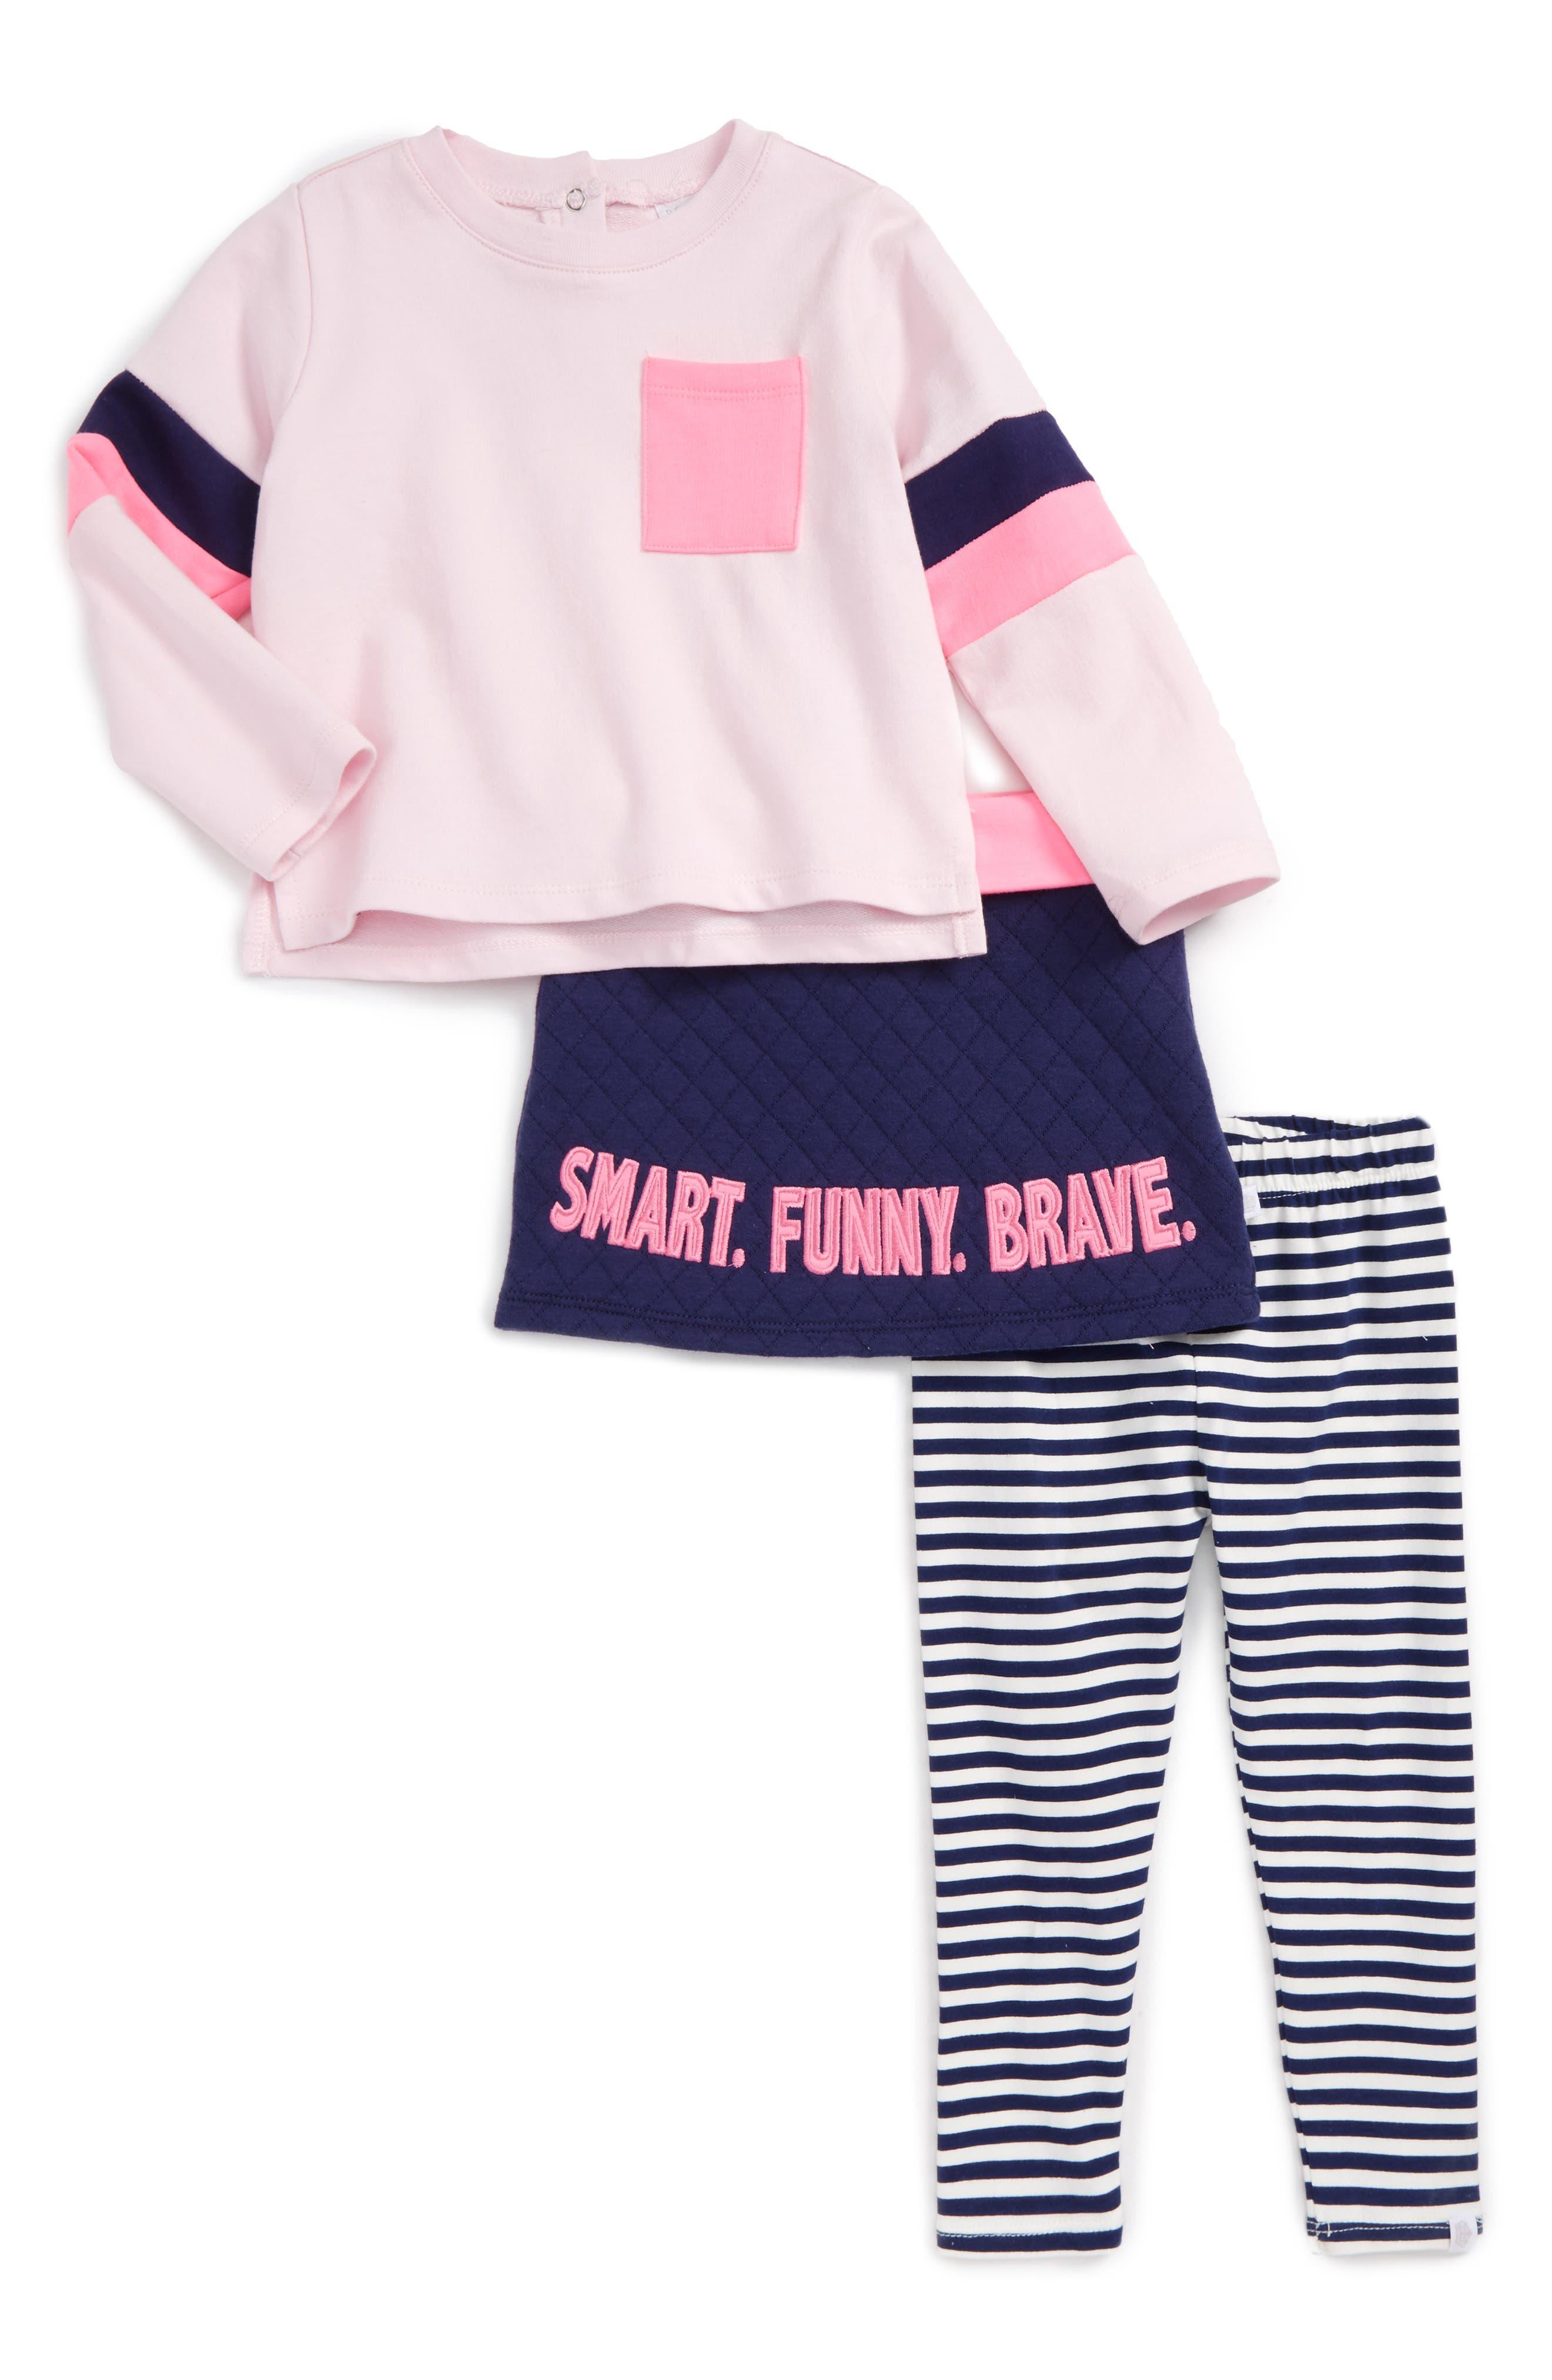 Smart Funny Brave Tee, Leggings & Skirt Set,                             Main thumbnail 1, color,